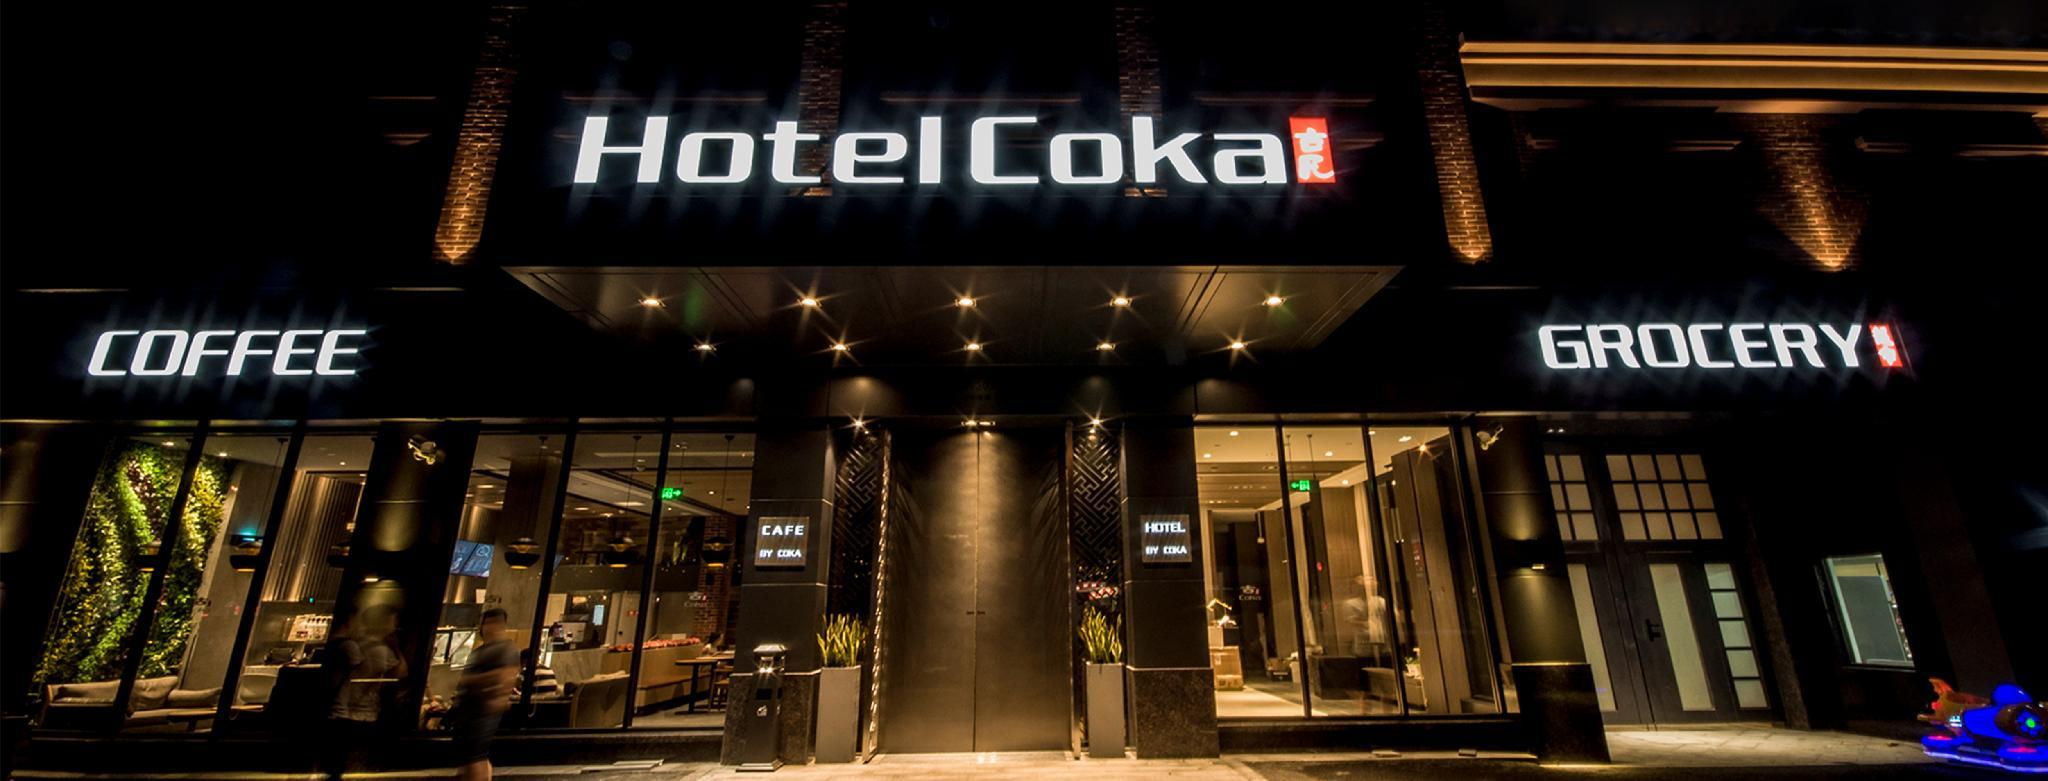 Hotel Coka Shanghai Pudong International Airport and Disney